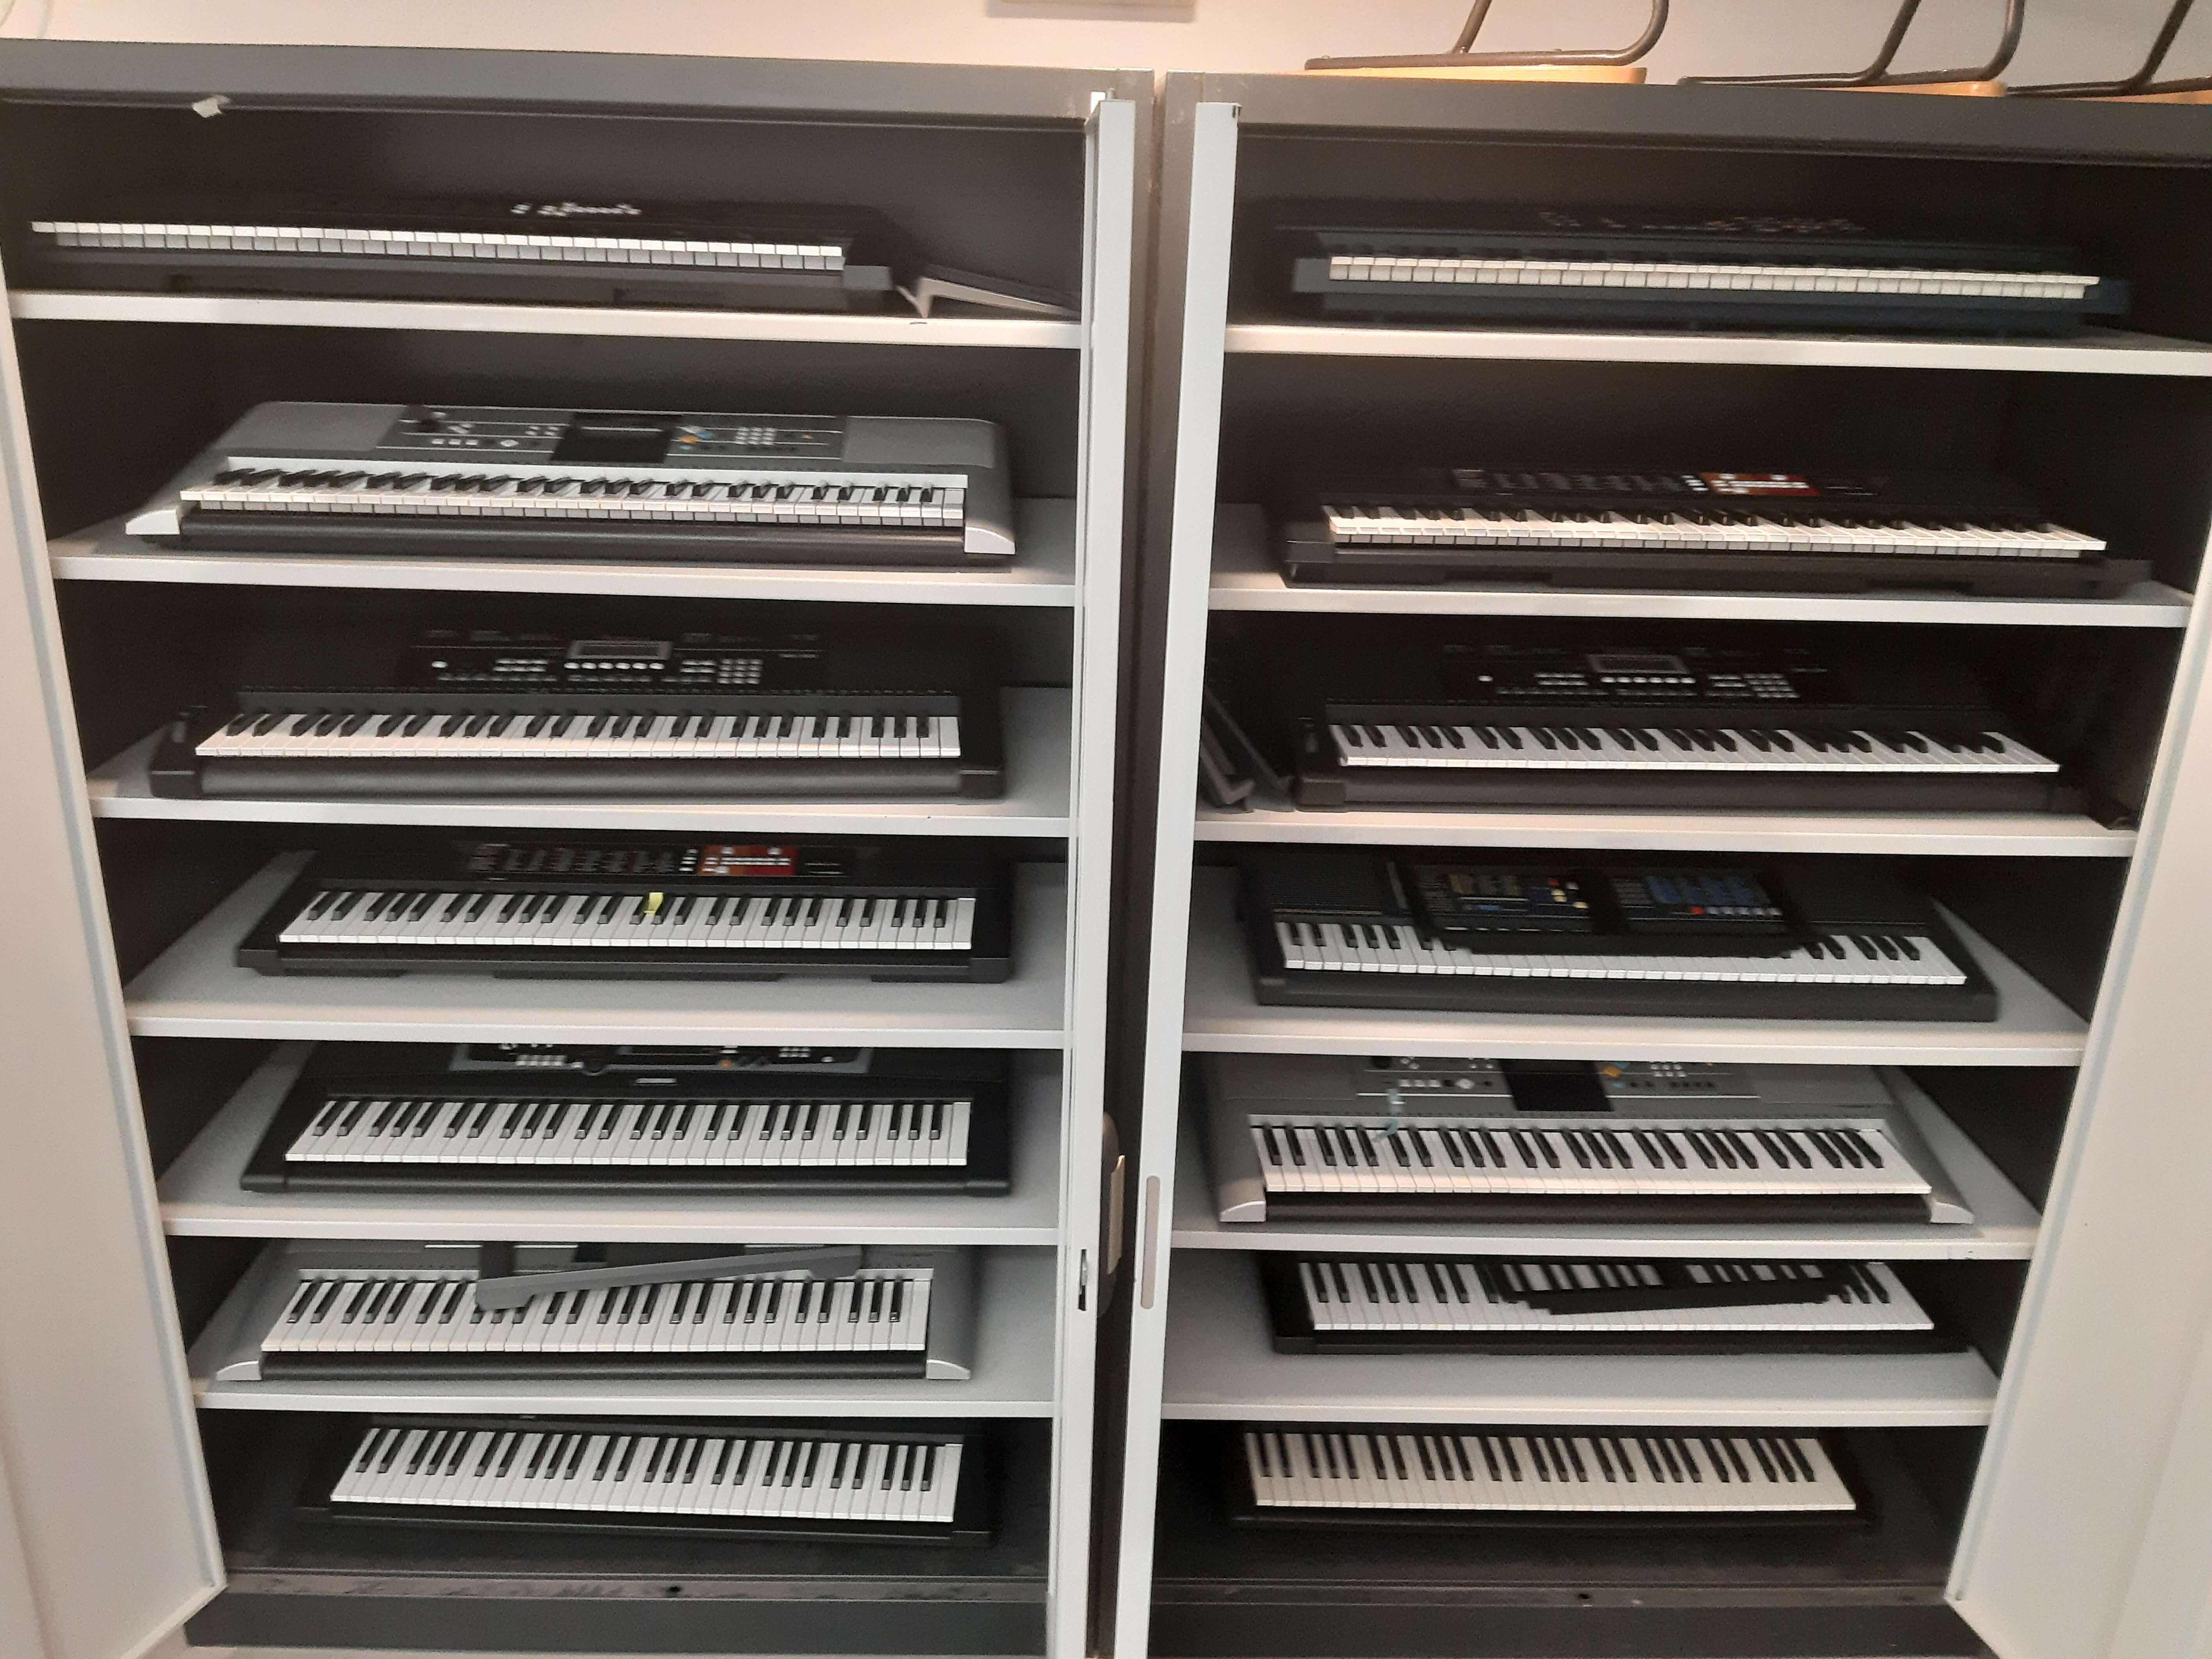 Keyboardschrank.jpg?auto=compress,format&colorquant=1600